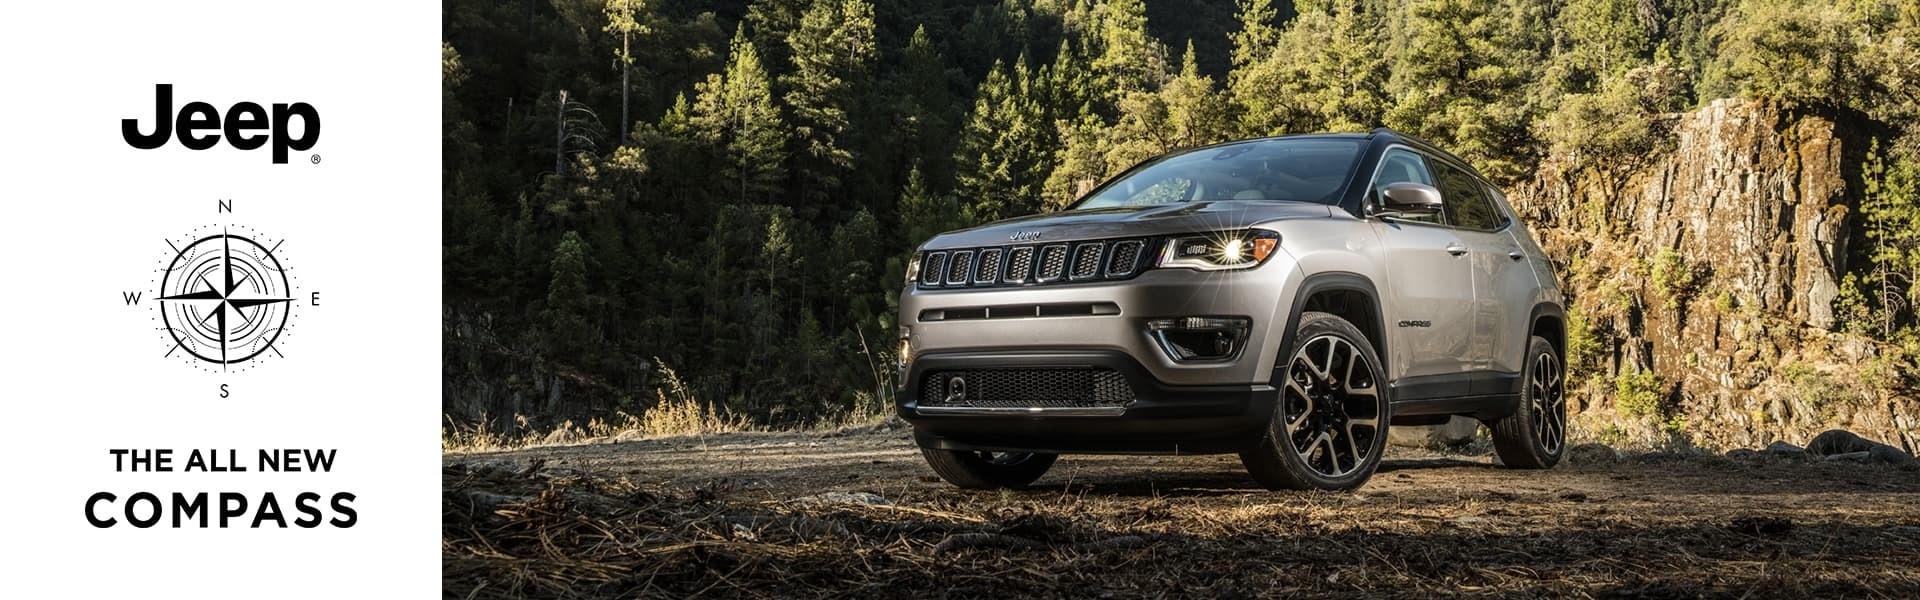 desktop-jeep